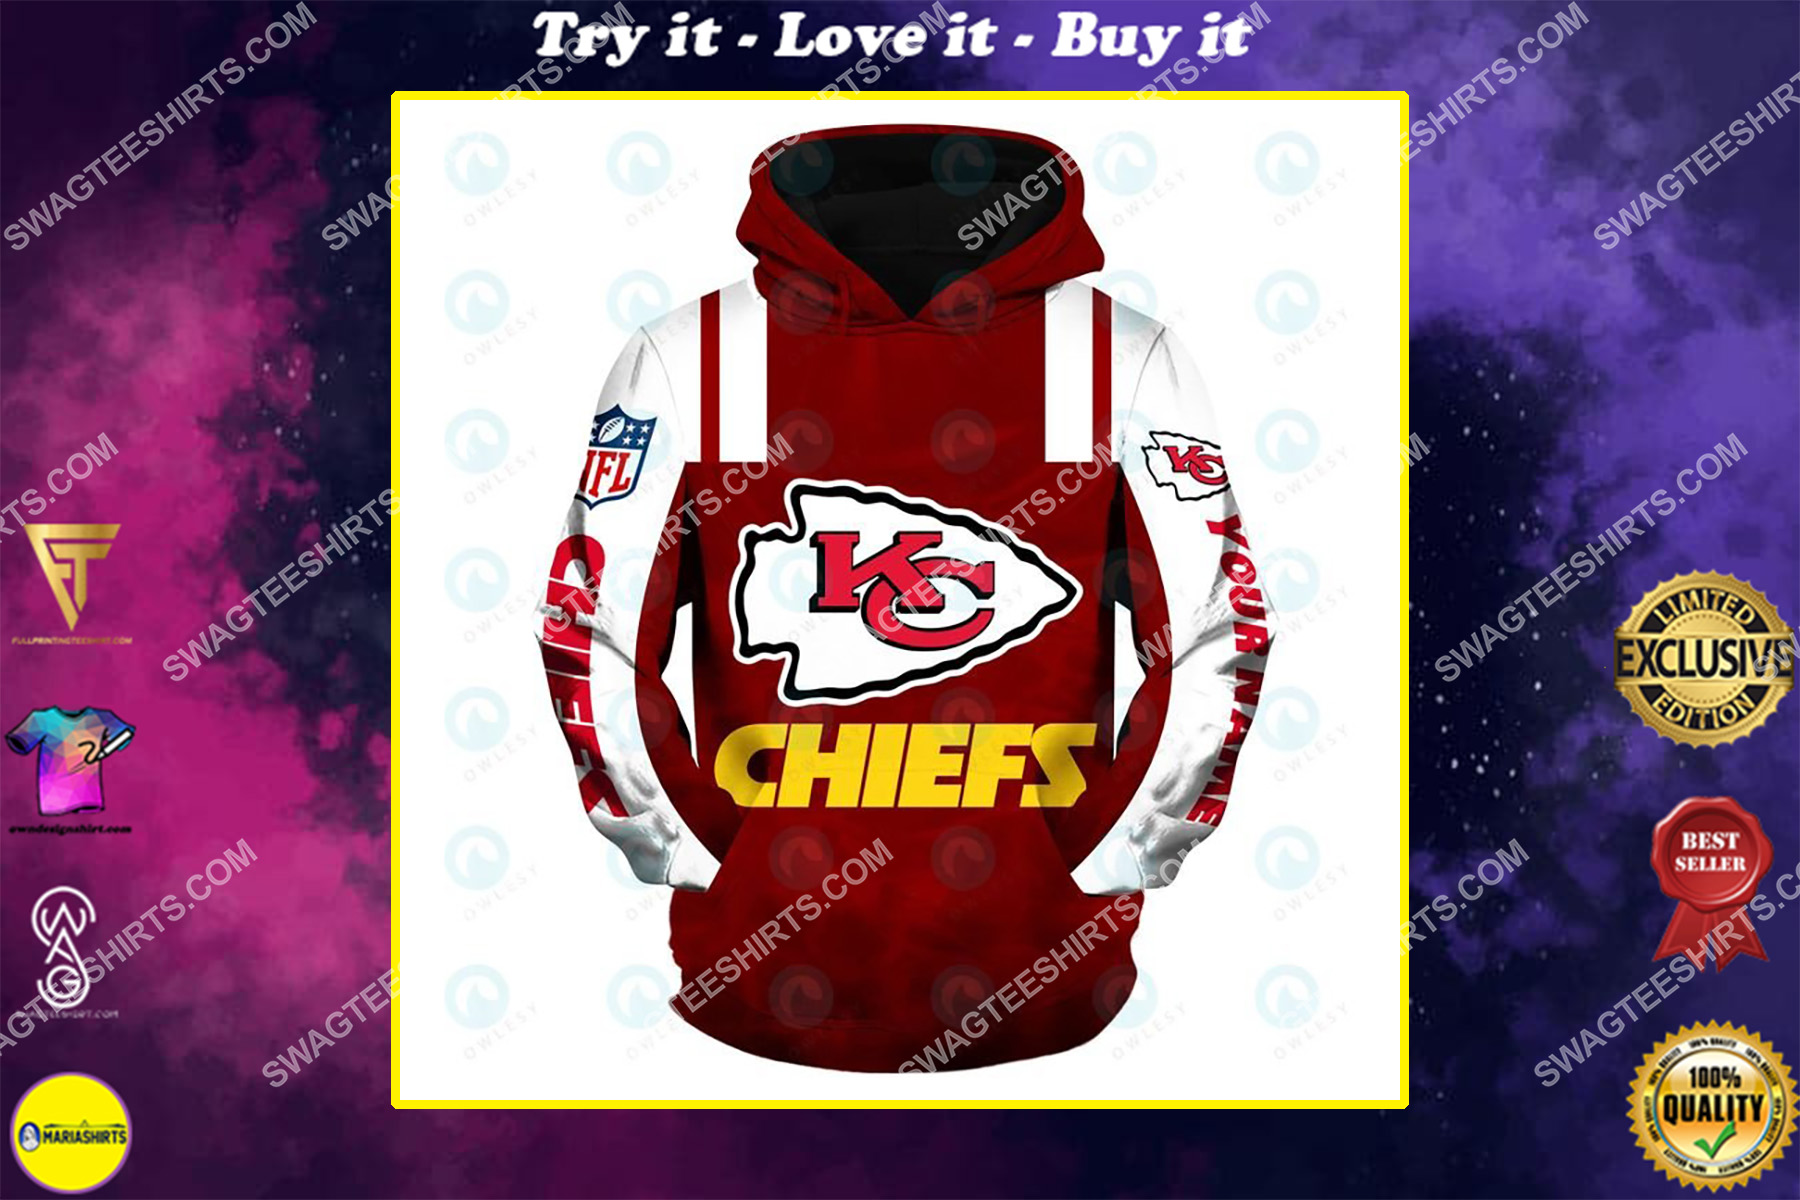 the american football team kansas chiefs all over printed shirt